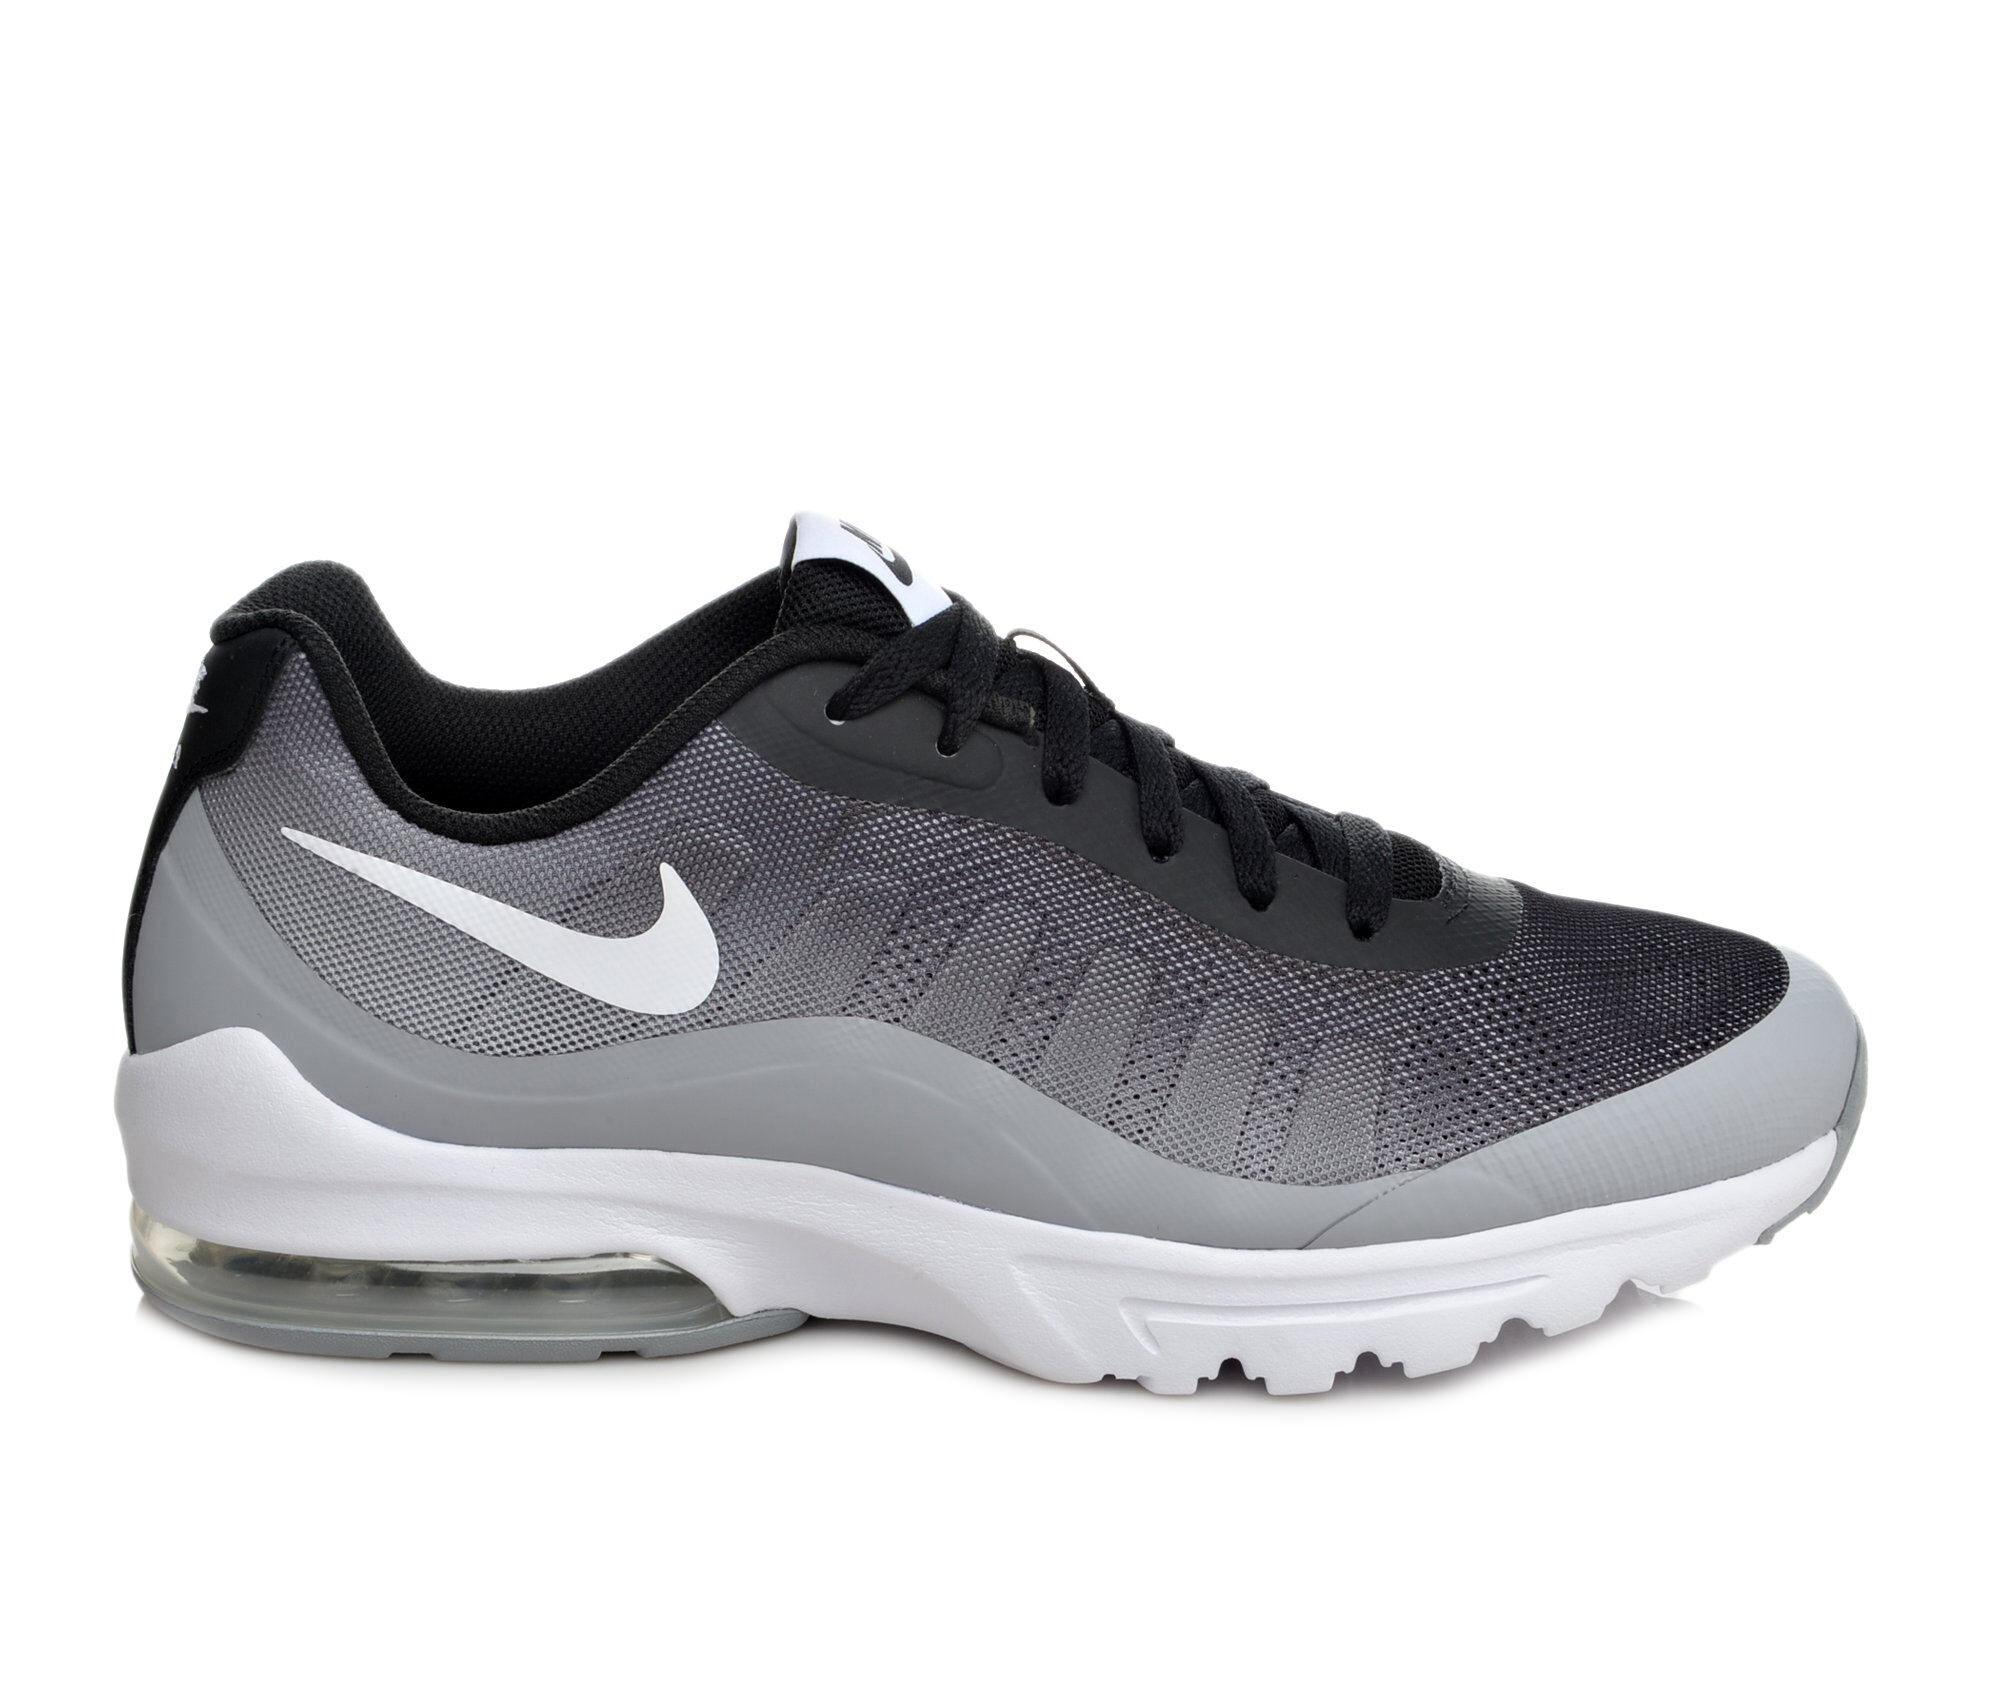 540a7045113e10 Nike Air Max Invigor Mens White Shoes Nike Air Max Invigor Print ...